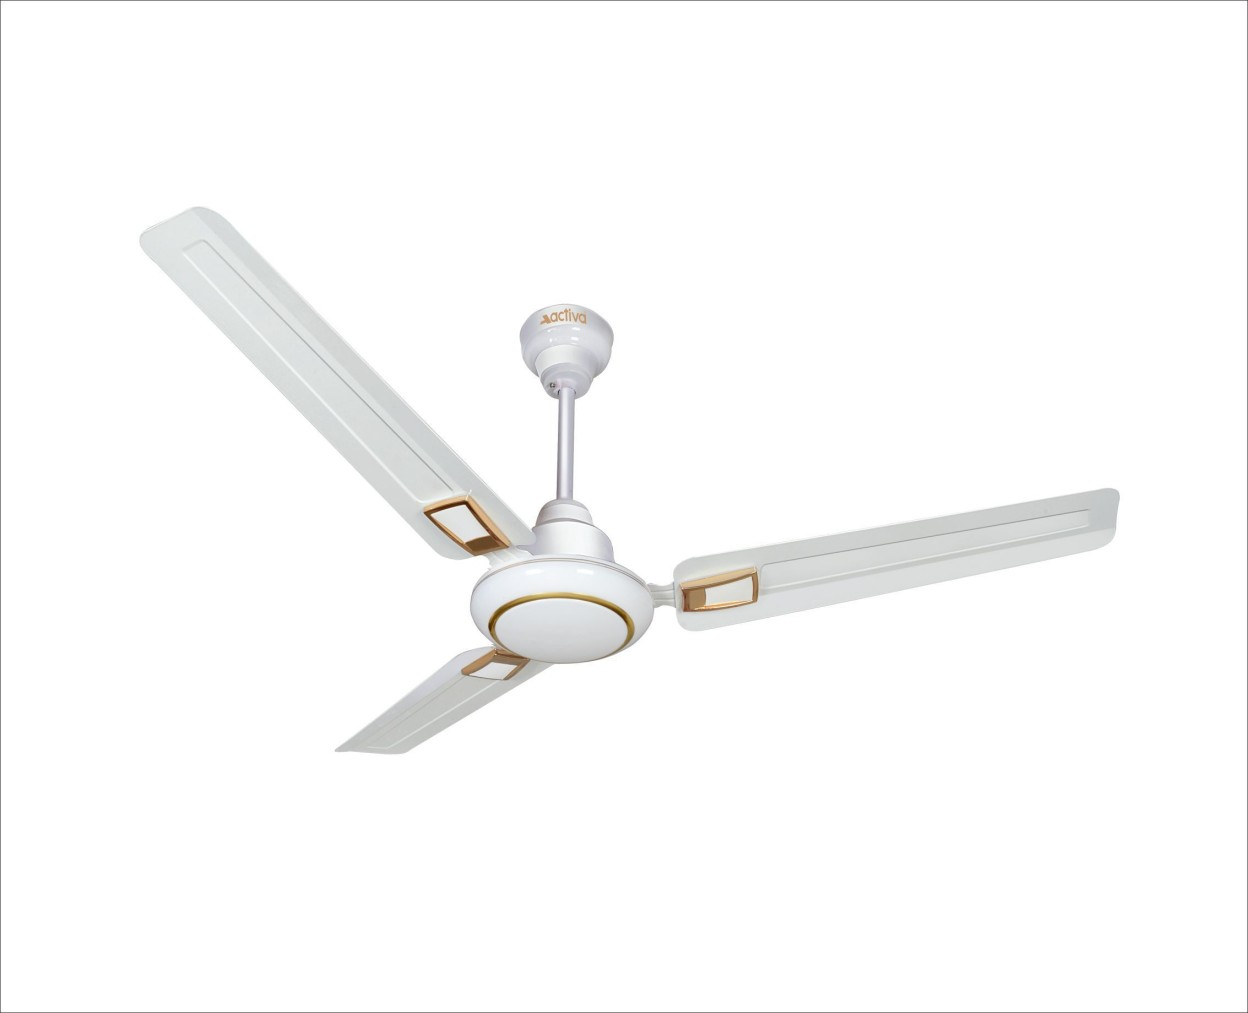 ACTIVA GALAXY-1 5 STAR 3 Blade Ceiling Fan(SILVER)